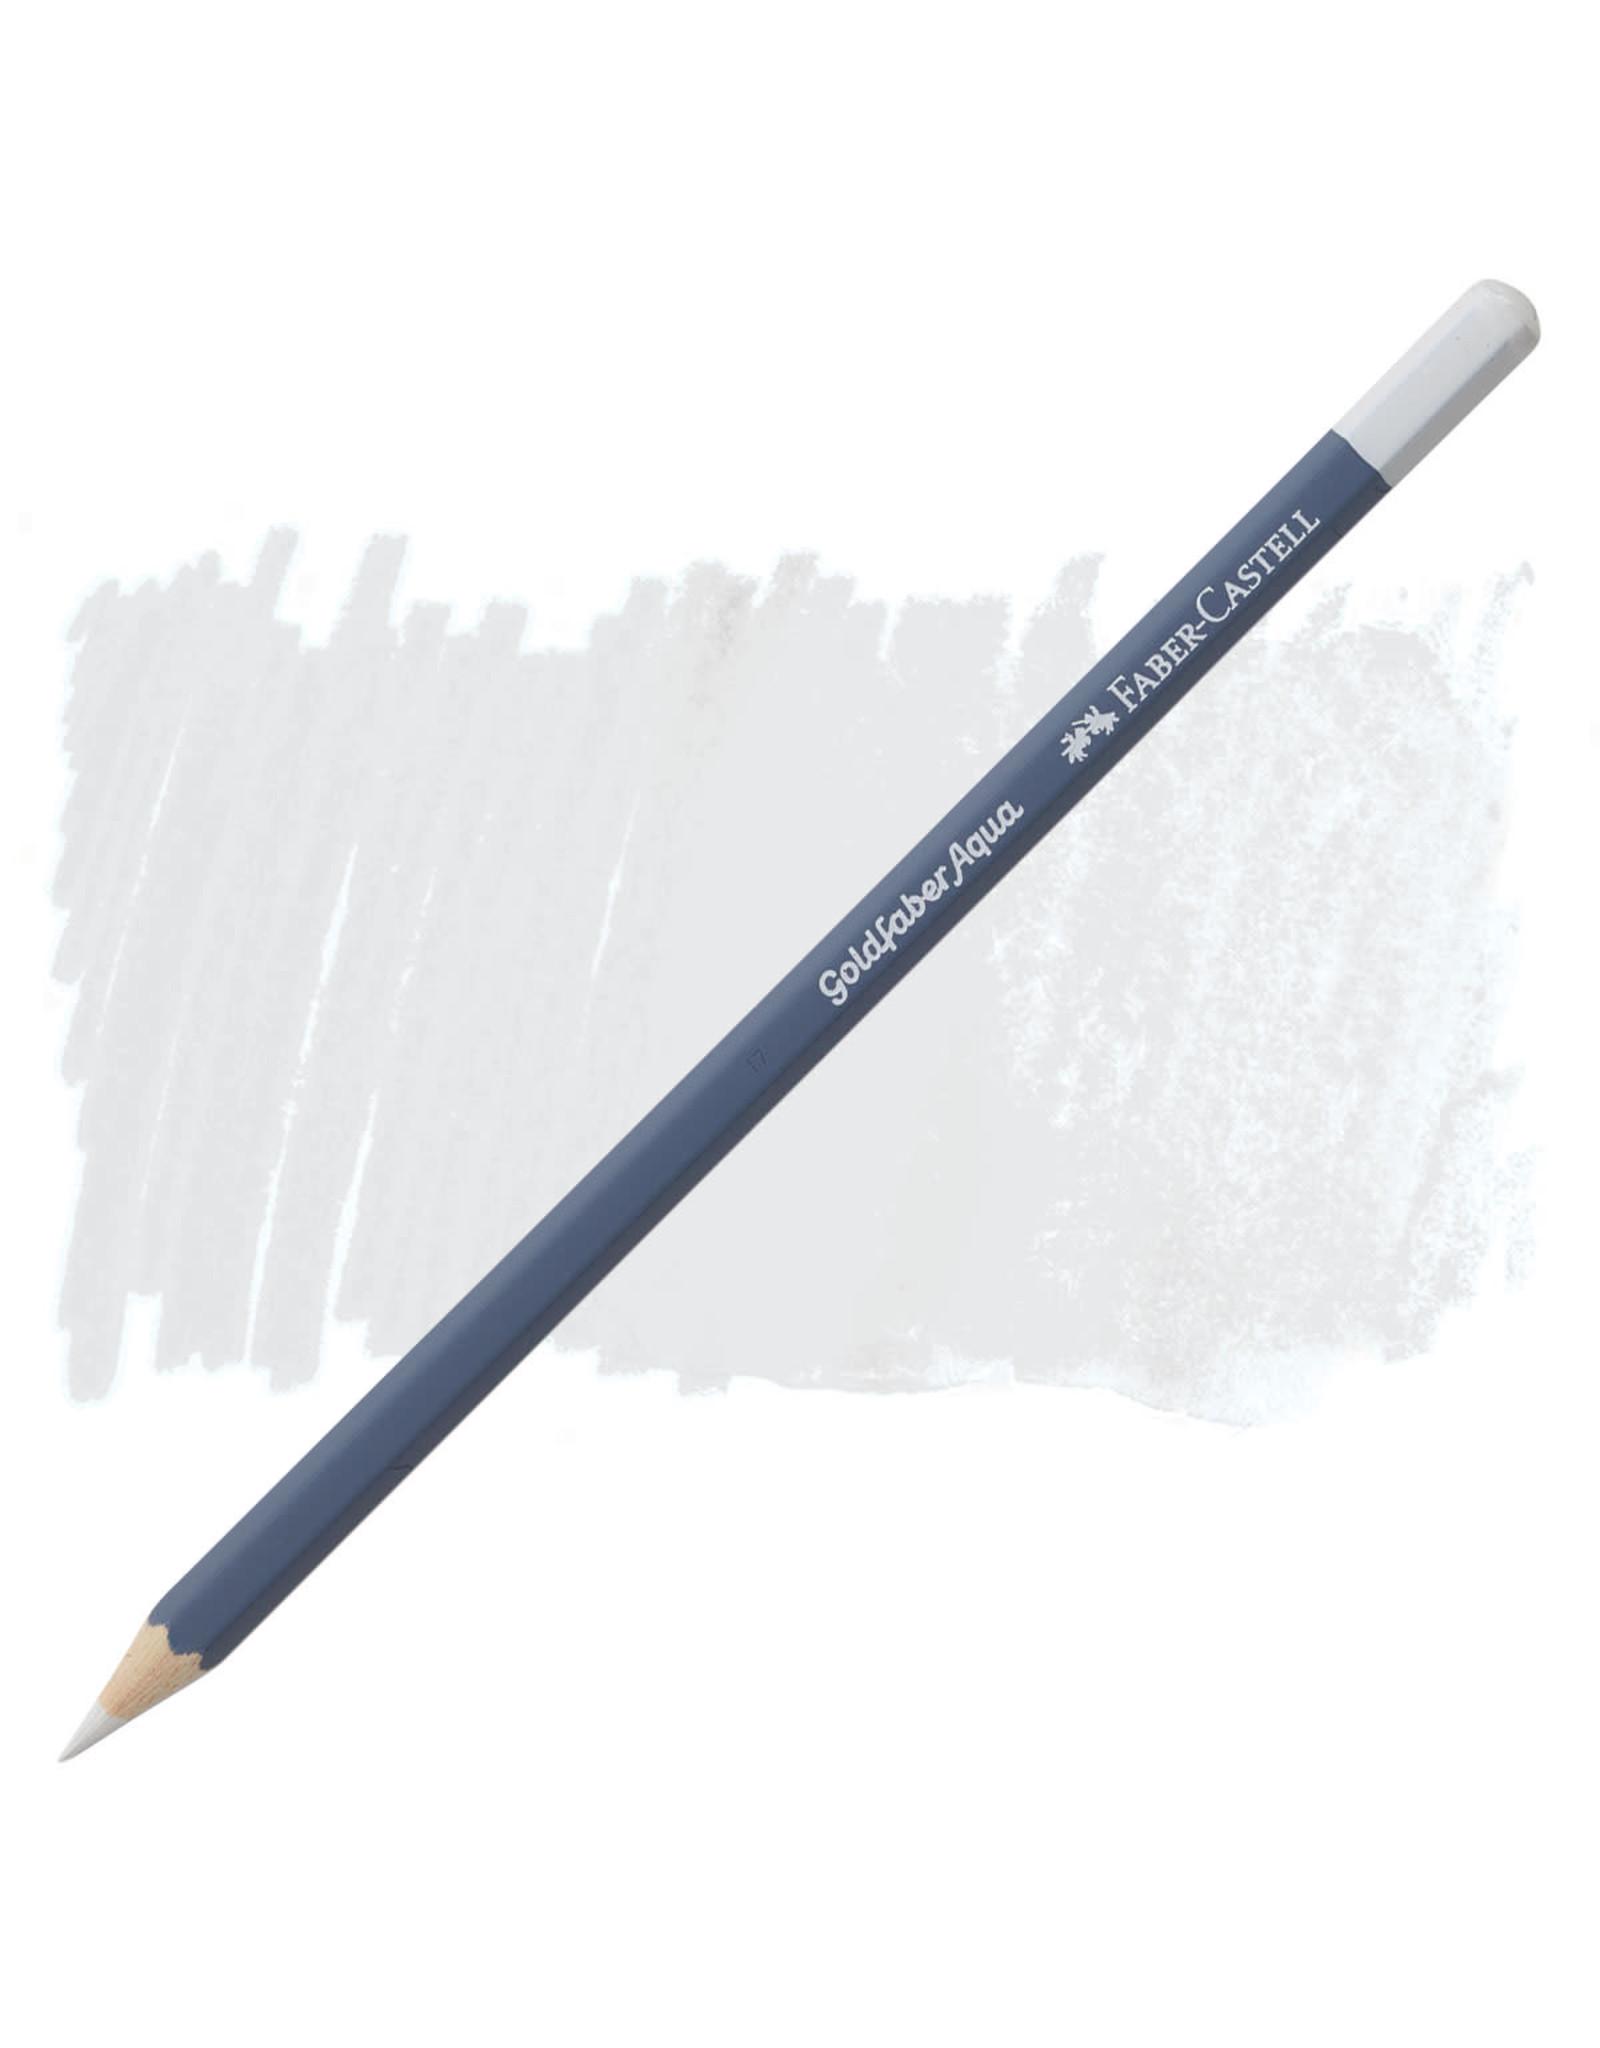 Faber-Castell Goldfaber Aqua Watercolor Pencil -  White #101